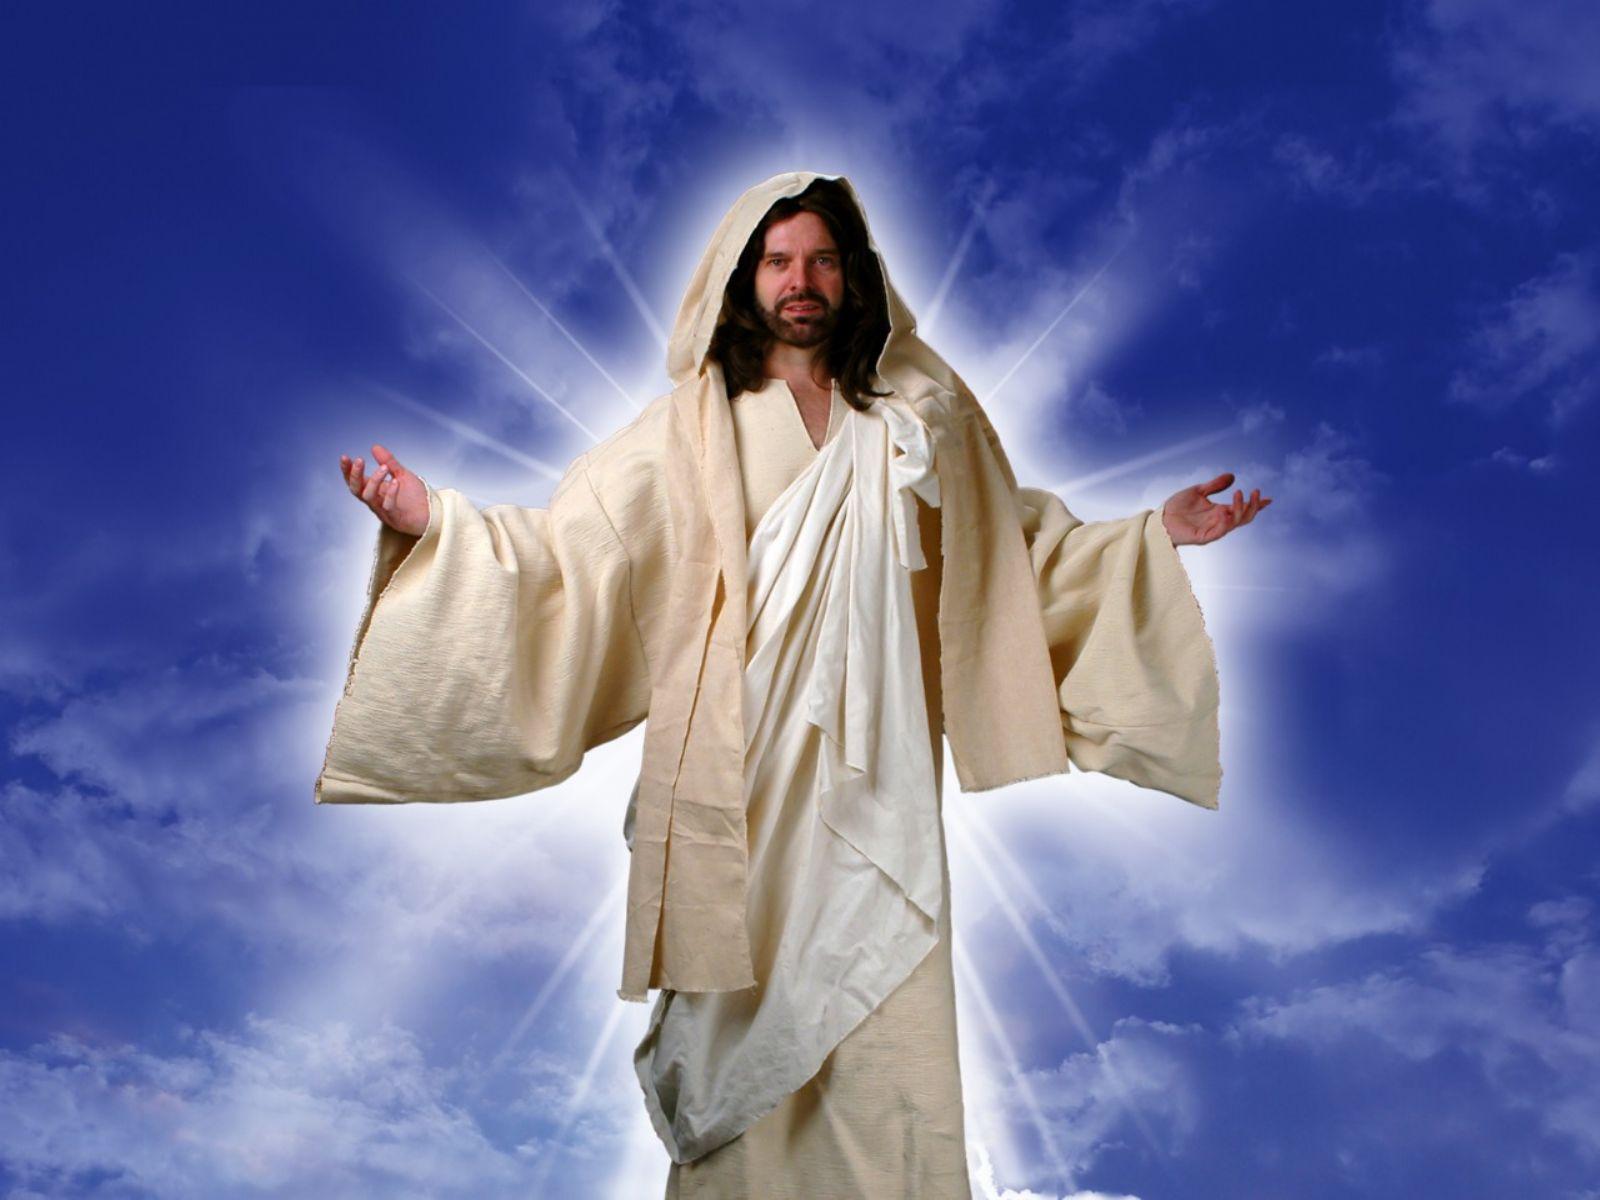 Lord Jesus HD Wallpapers ~ God wallpaper hd